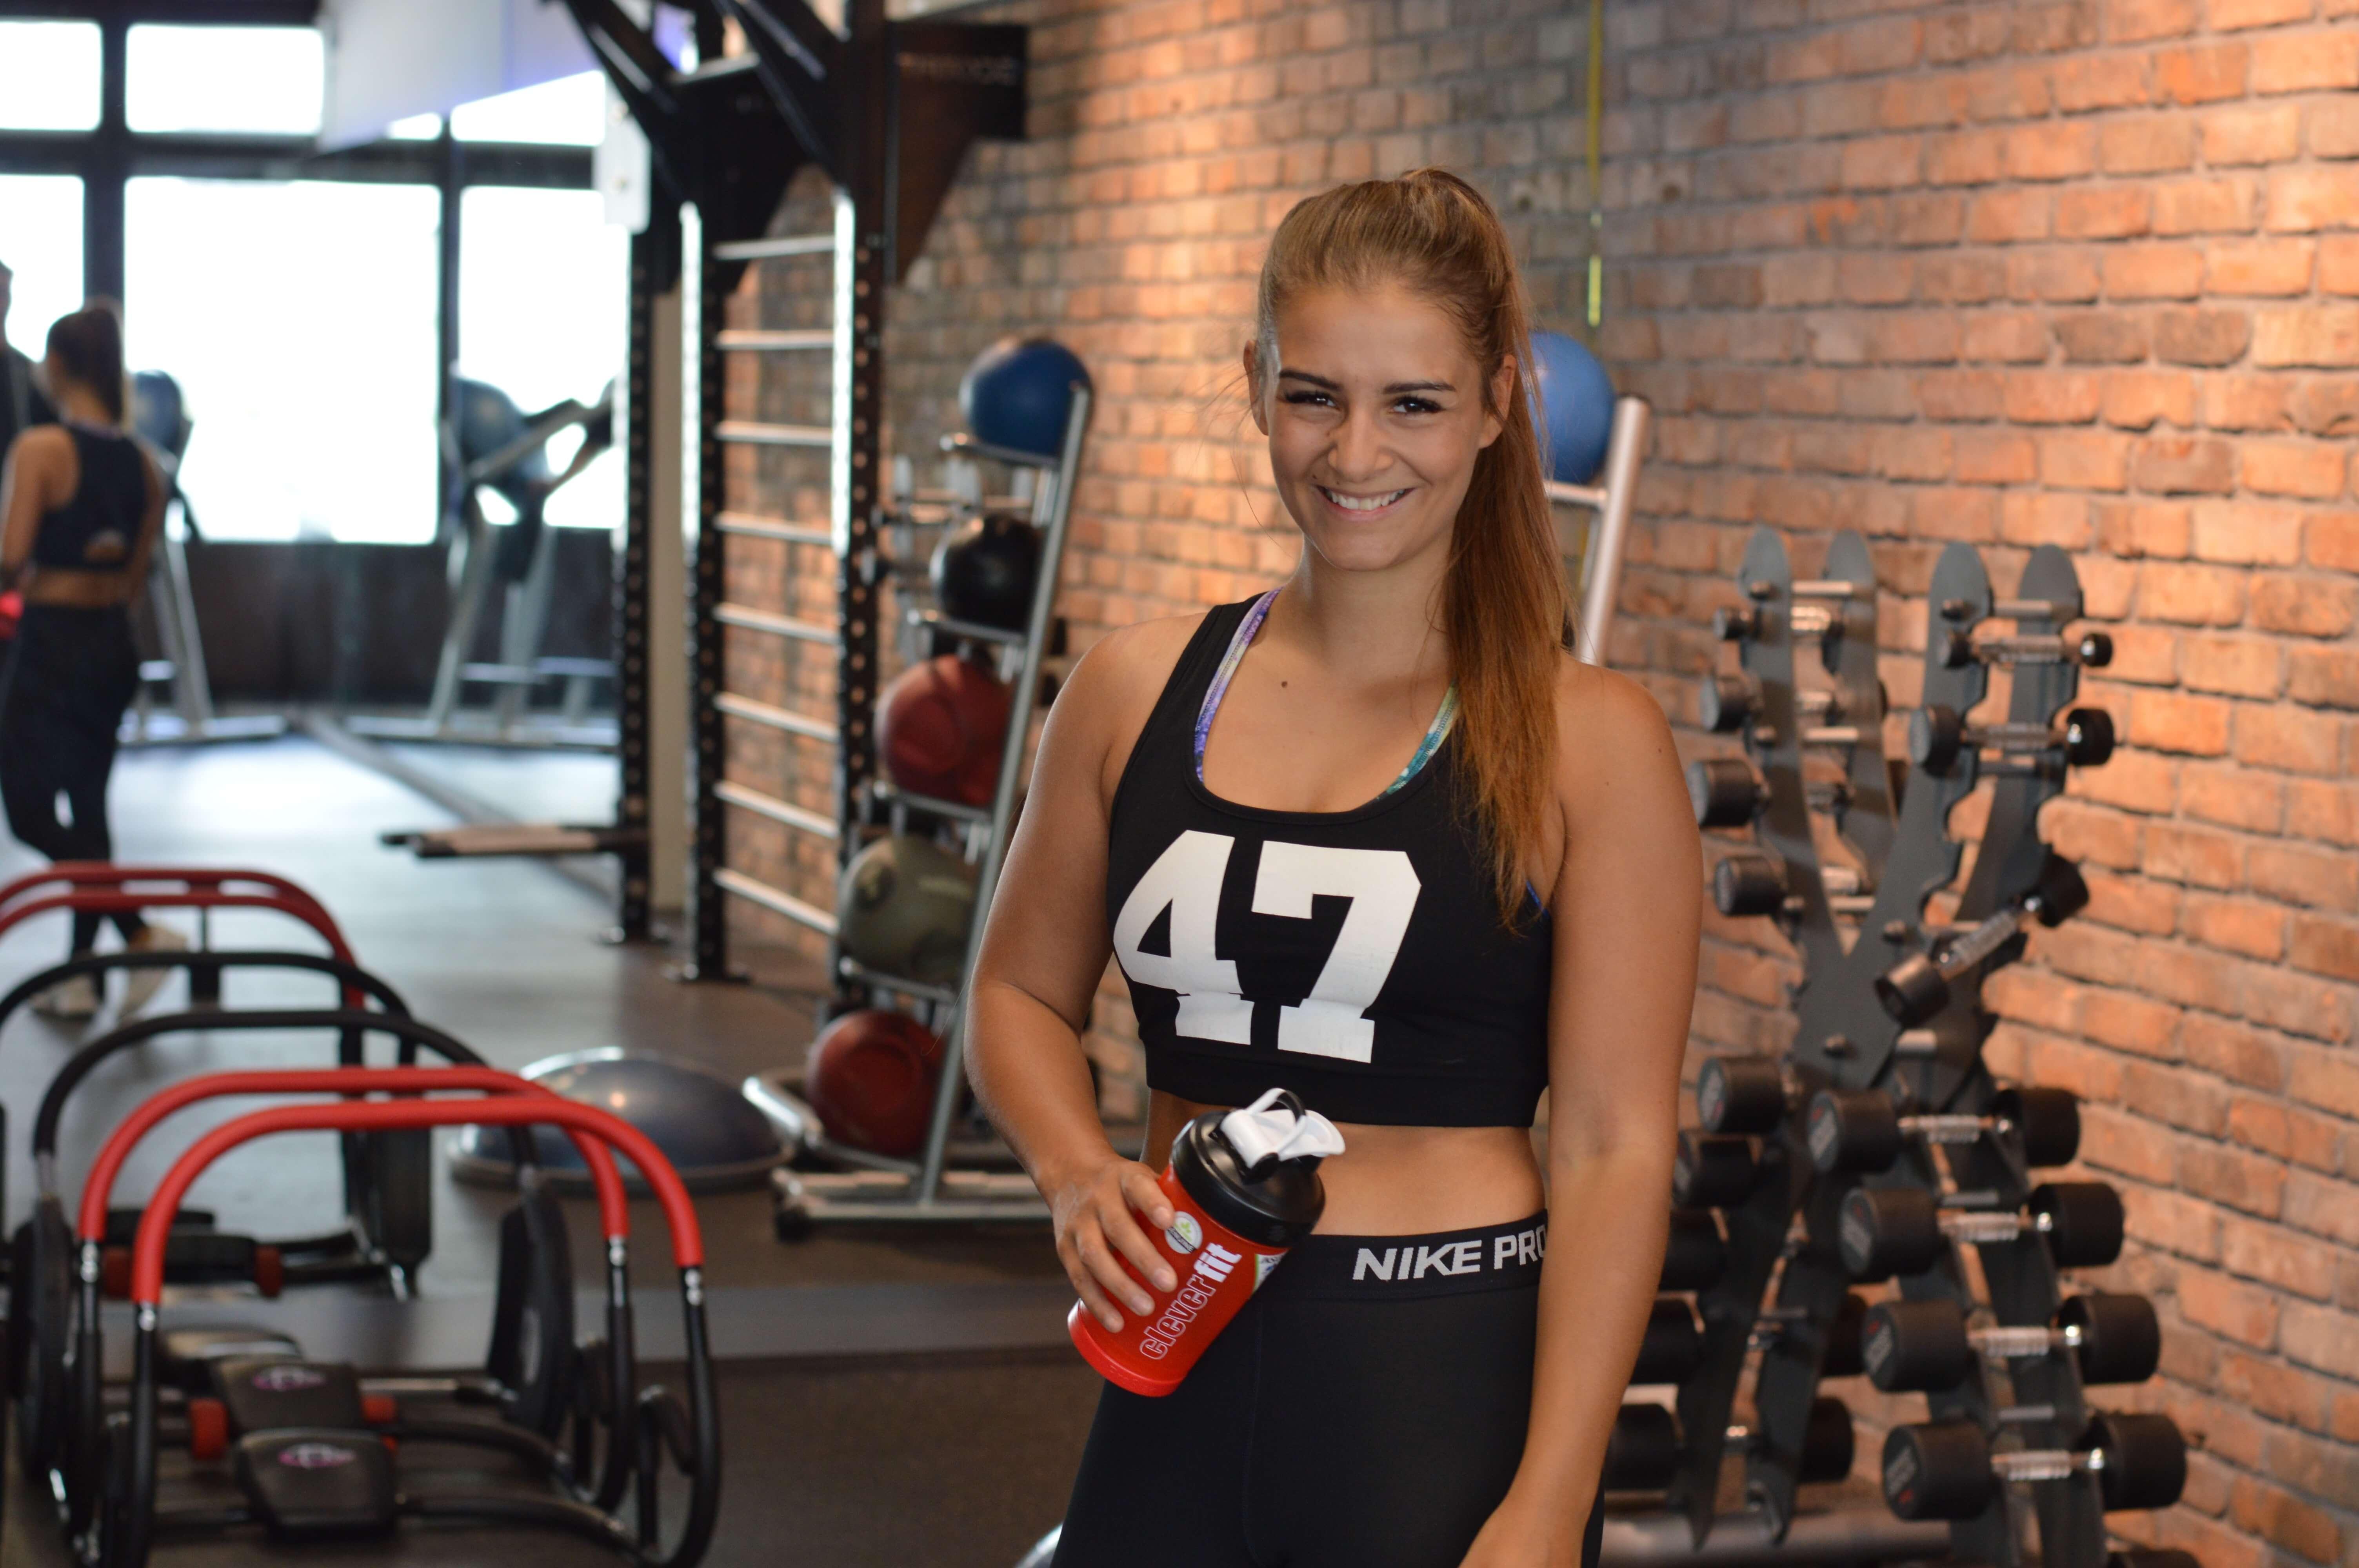 fitness-mythen-trainhard-eatwell-was-ist-wahr